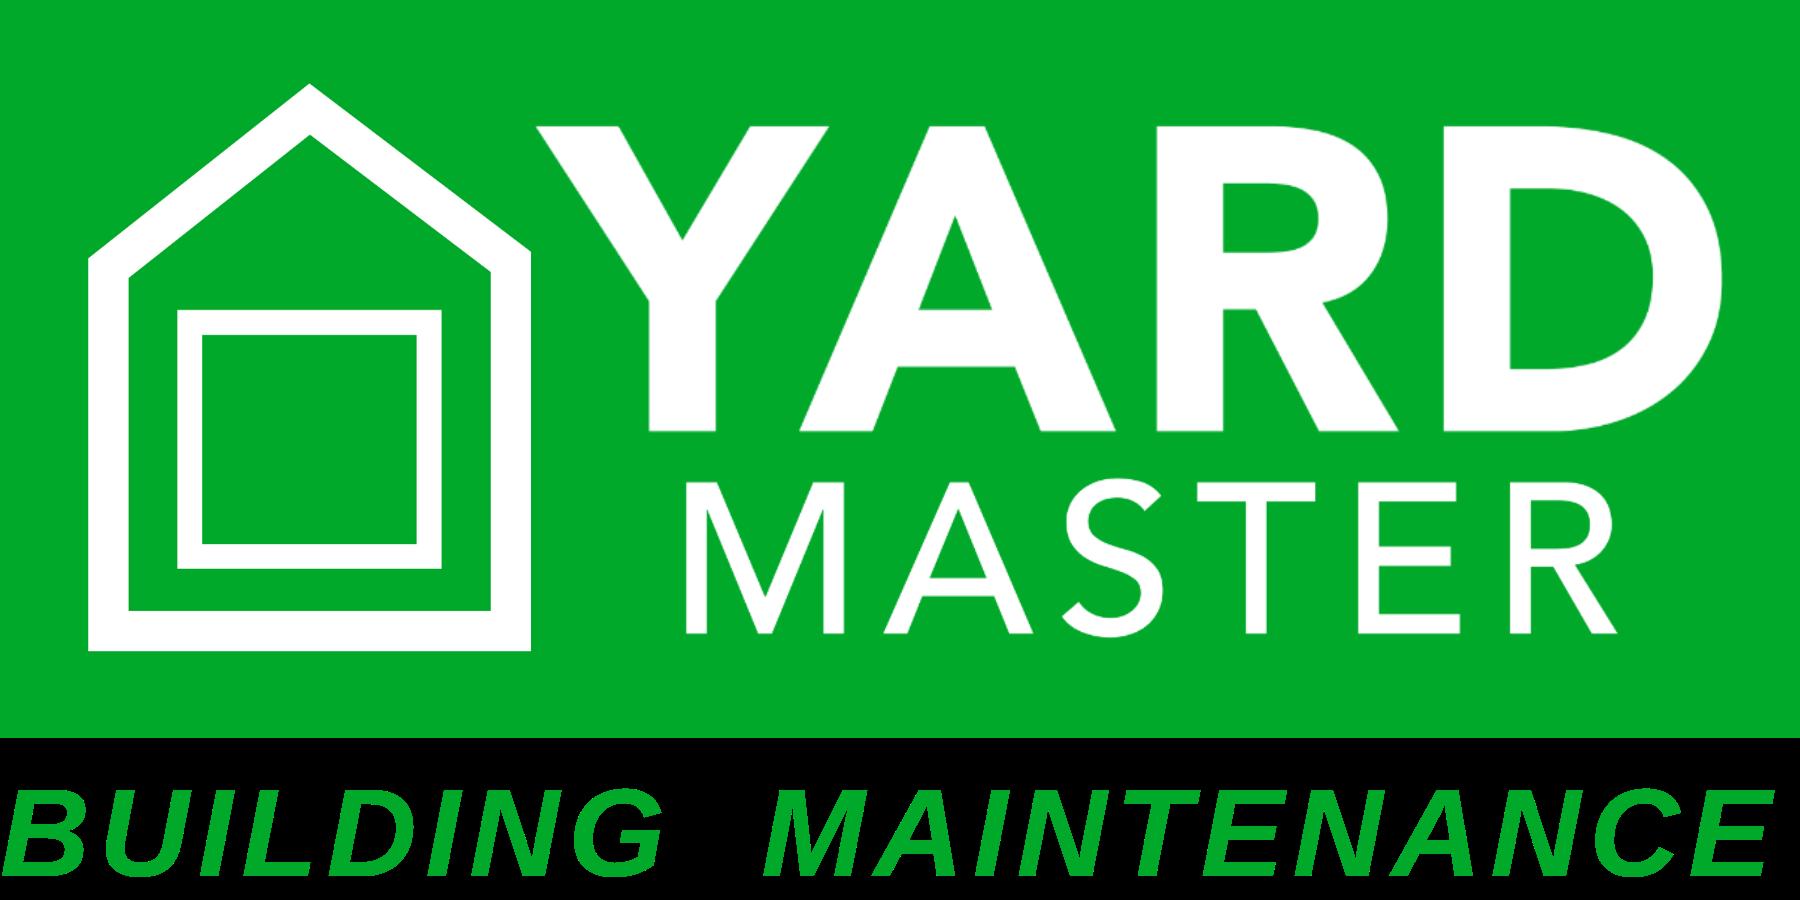 YARDmaster Coolum - Marcoola, QLD 4564 - 0411 080 836 | ShowMeLocal.com